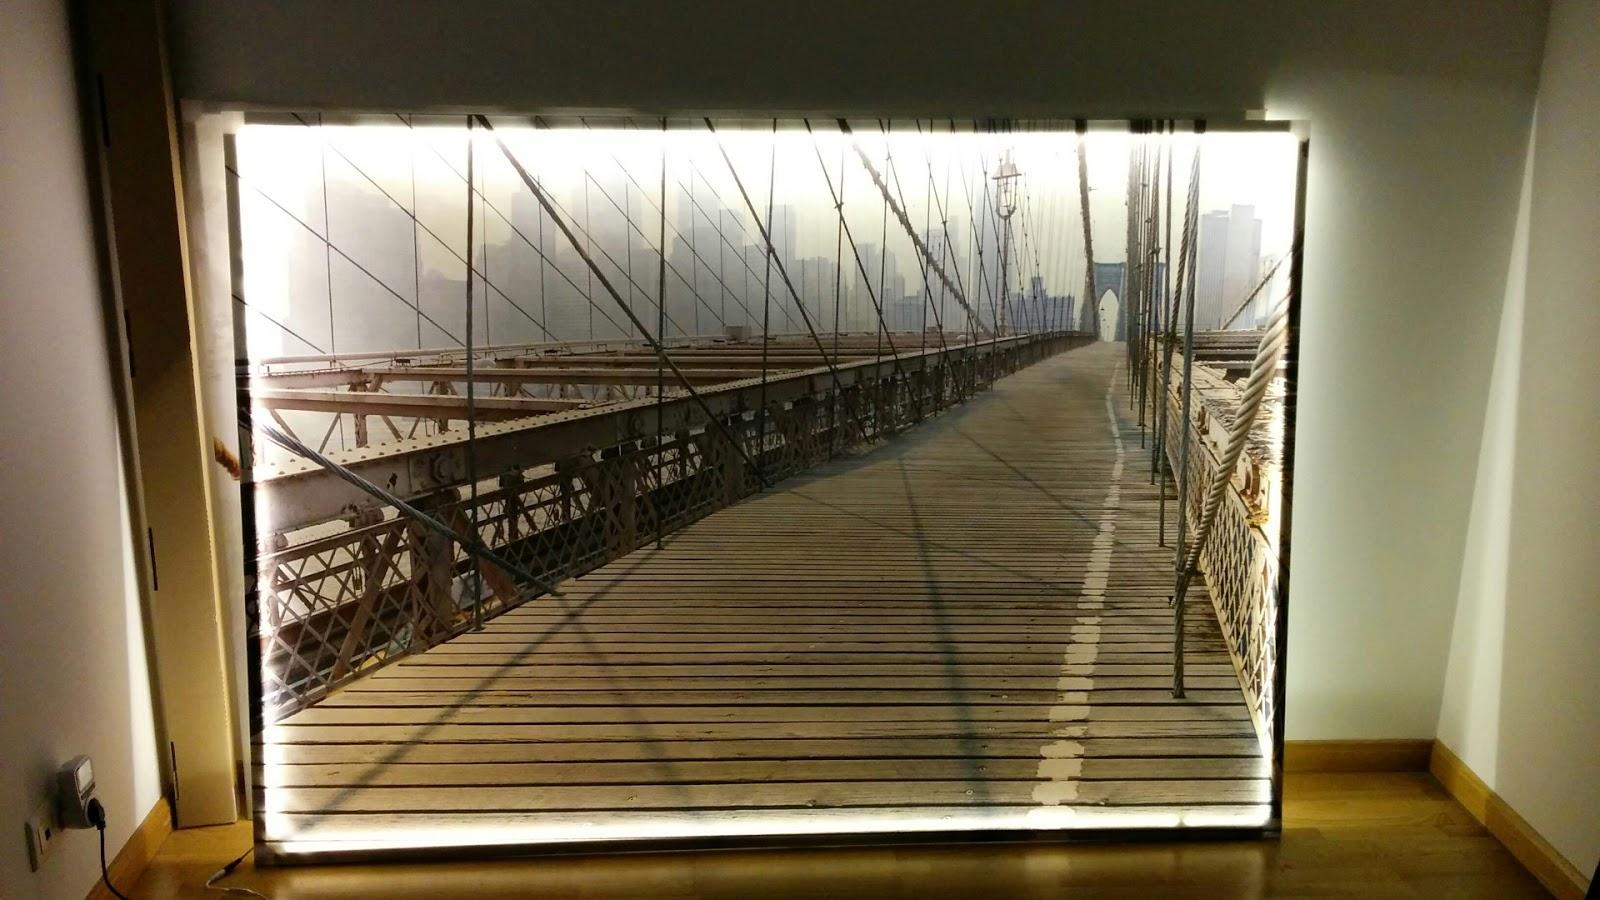 Cosas de cosas: Retroilumina tu cuadro de Ikea con luces led